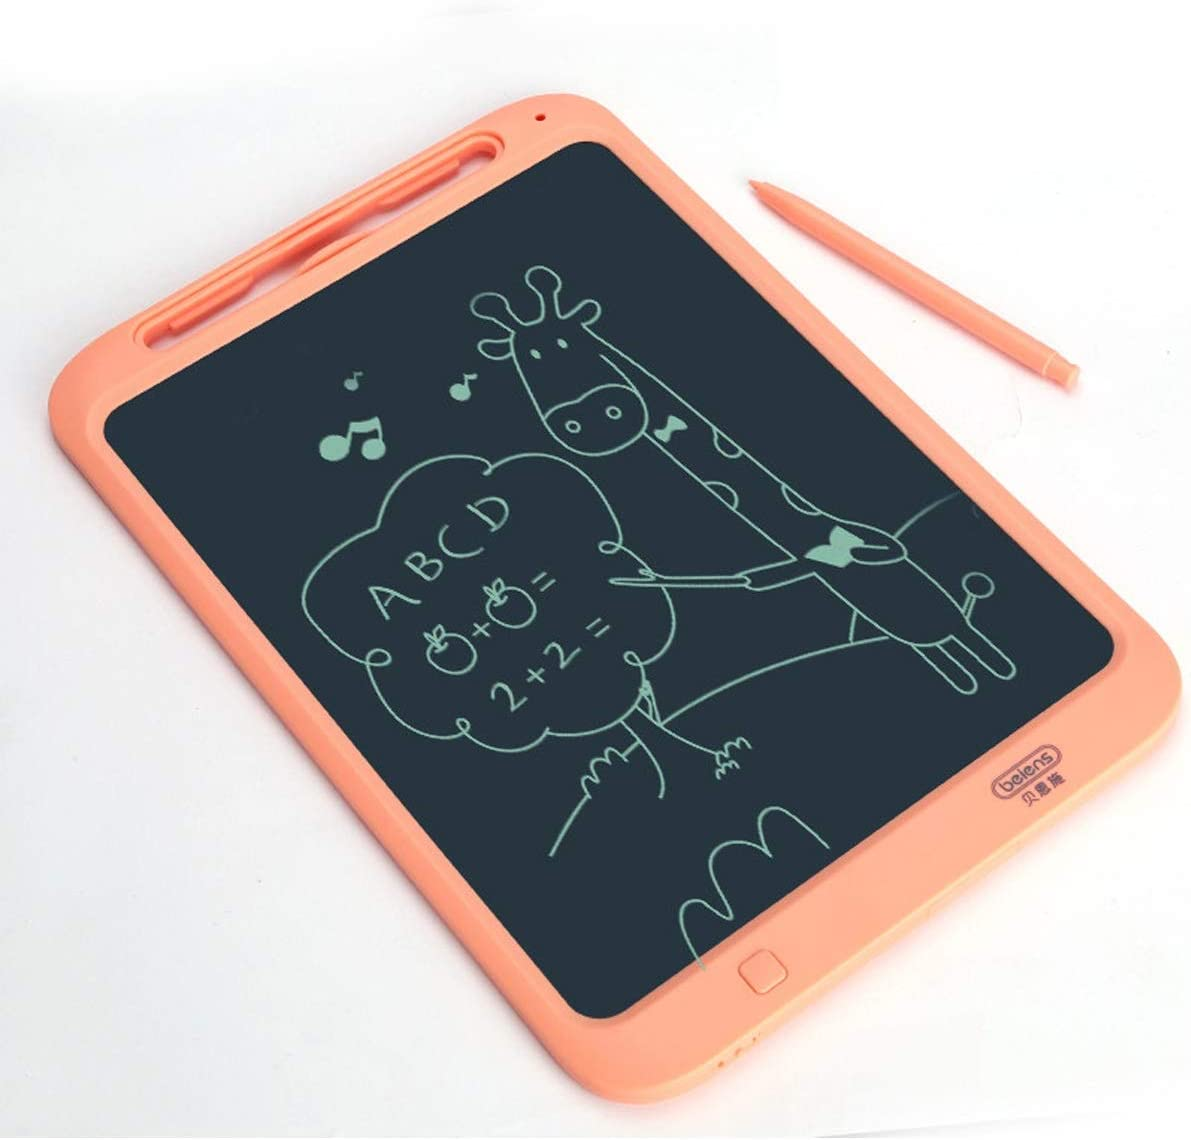 8haowenju Sketchpad LCD Tablet Red Sketchpad Color : Blue Graffiti Board Blue Non-Magnetic Writing Board Light Blackboard